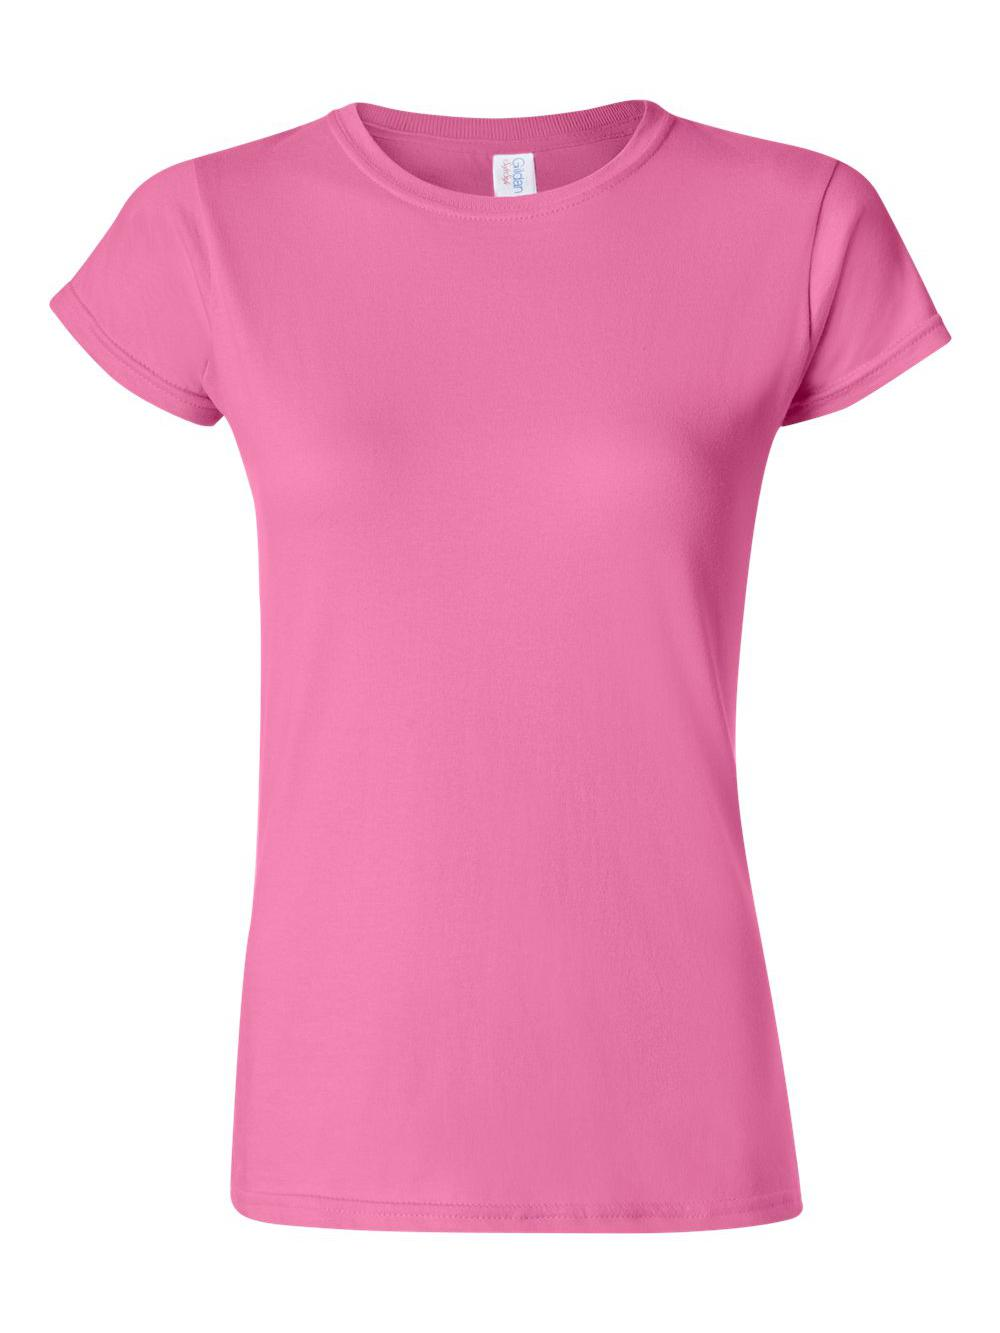 Gildan-Softstyle-Women-039-s-T-Shirt-64000L thumbnail 6